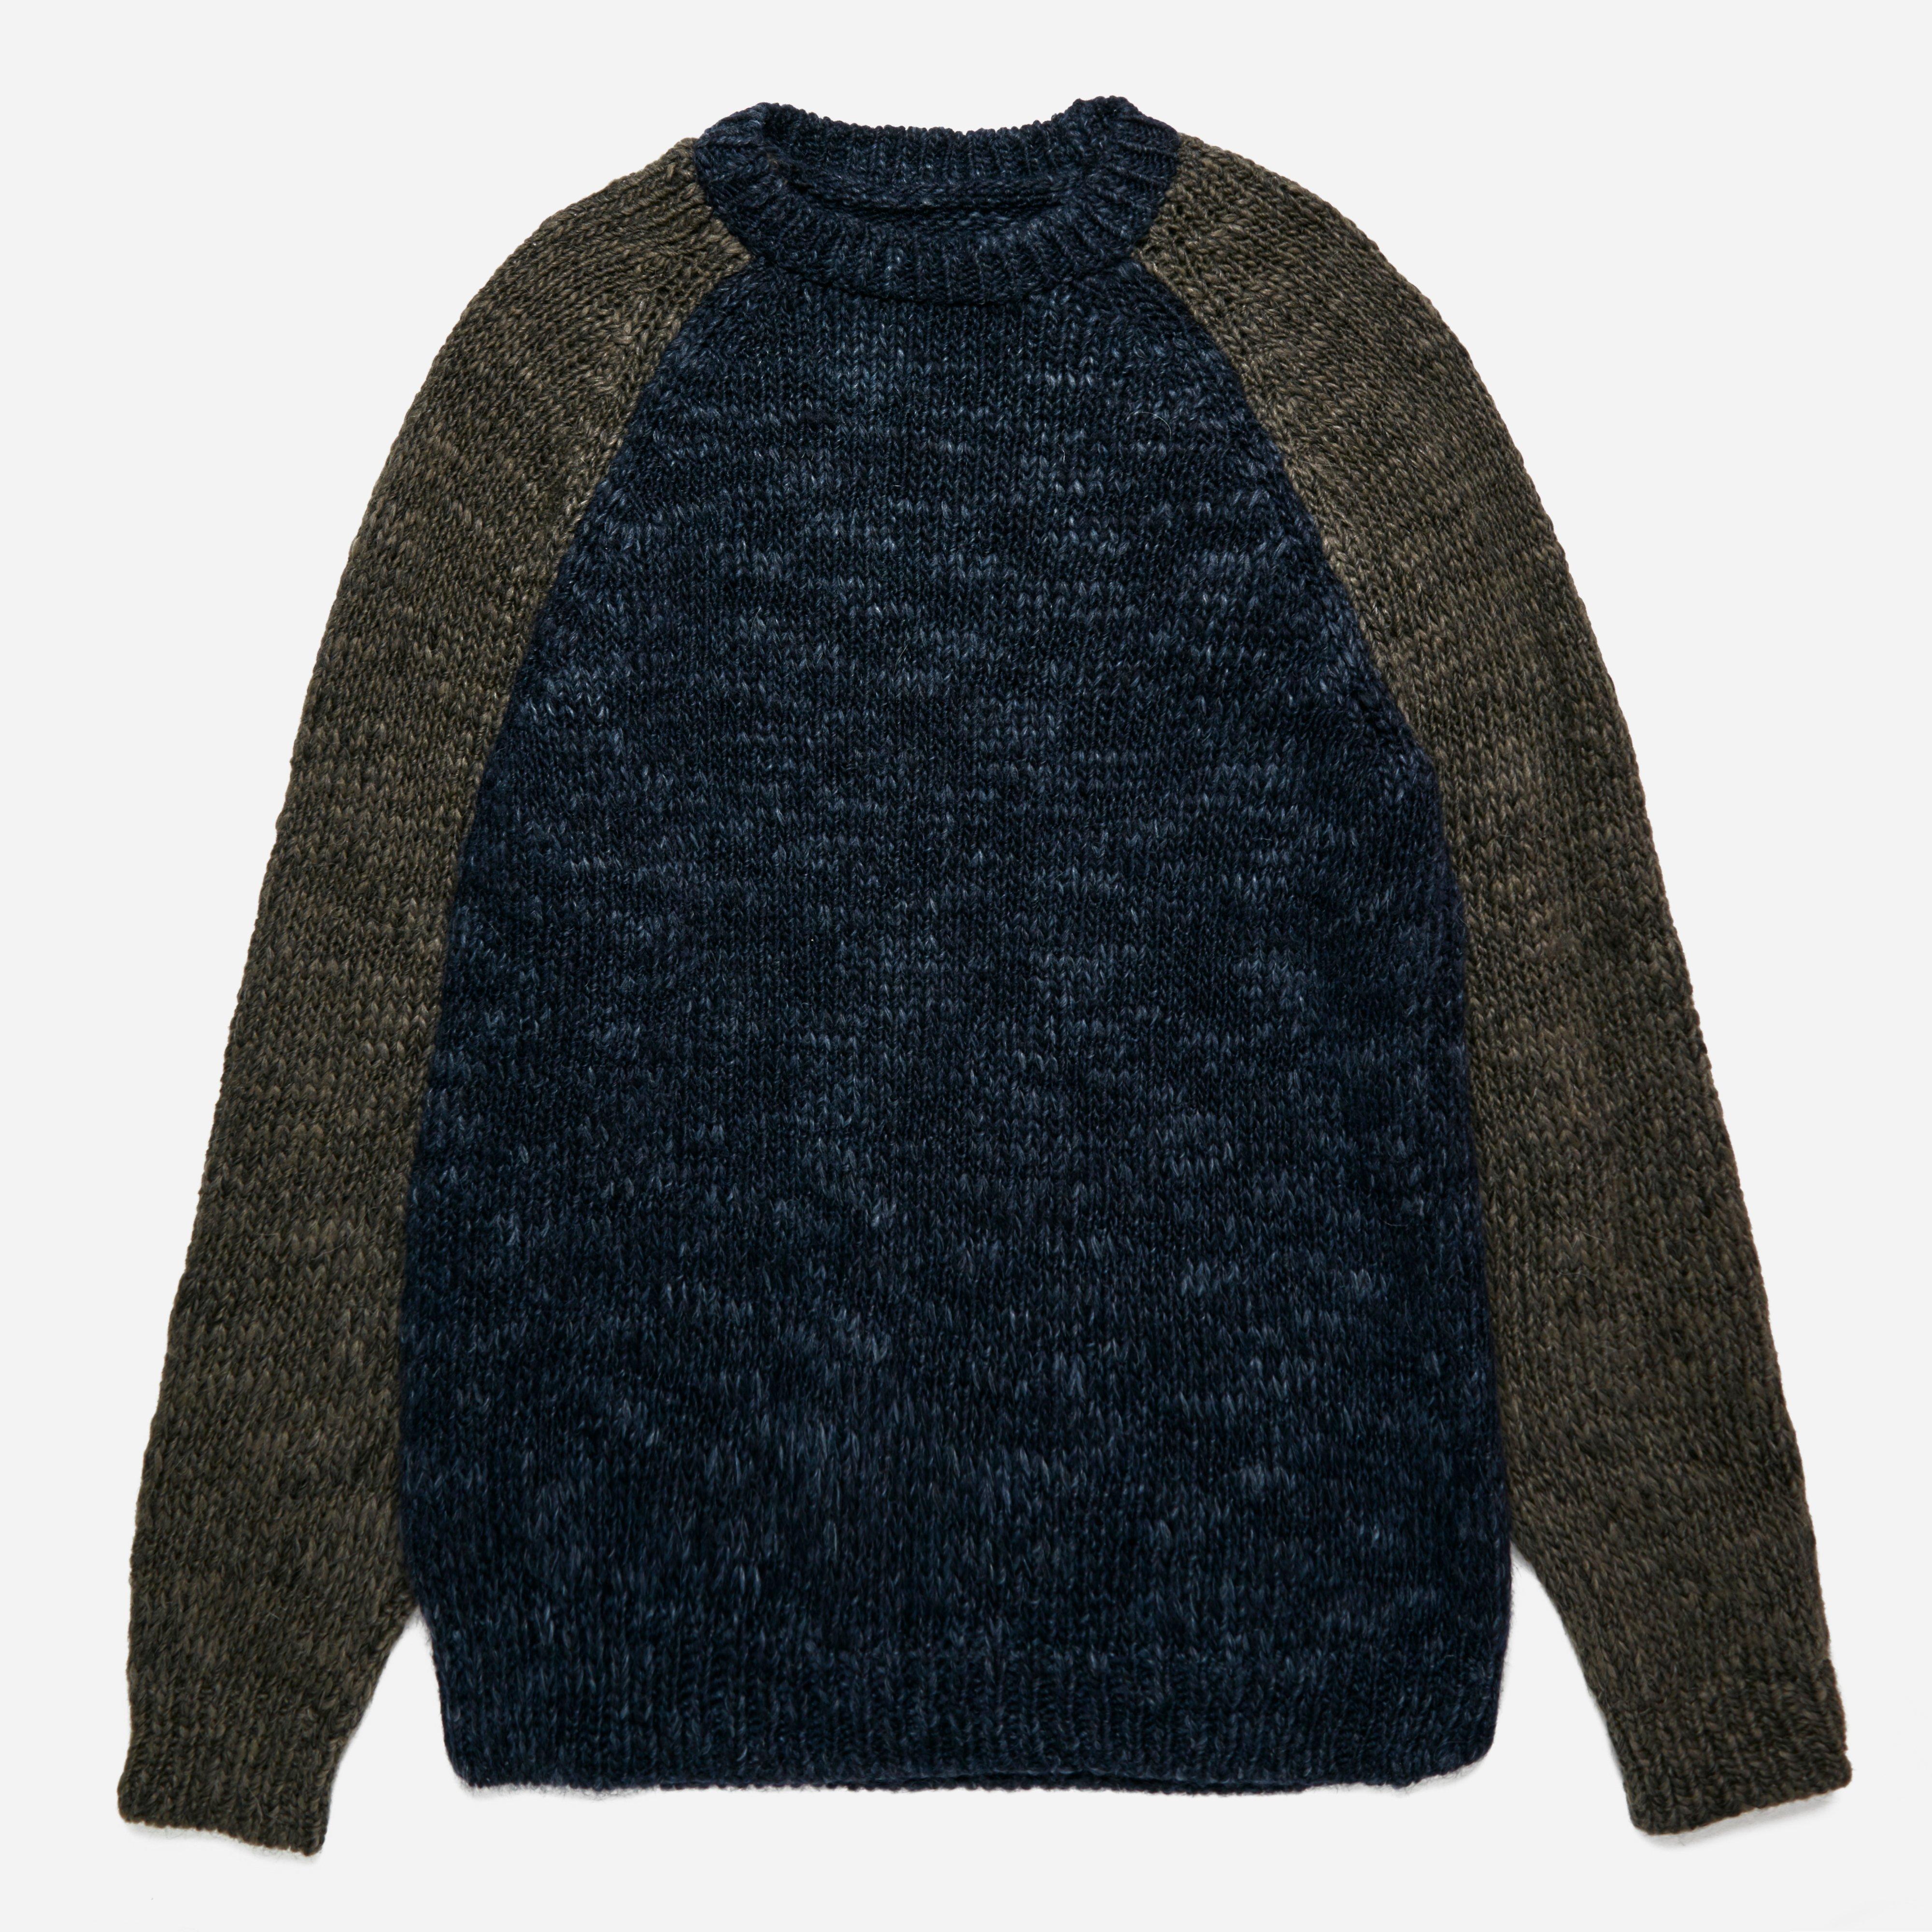 Y.M.C Wee Tam Knit